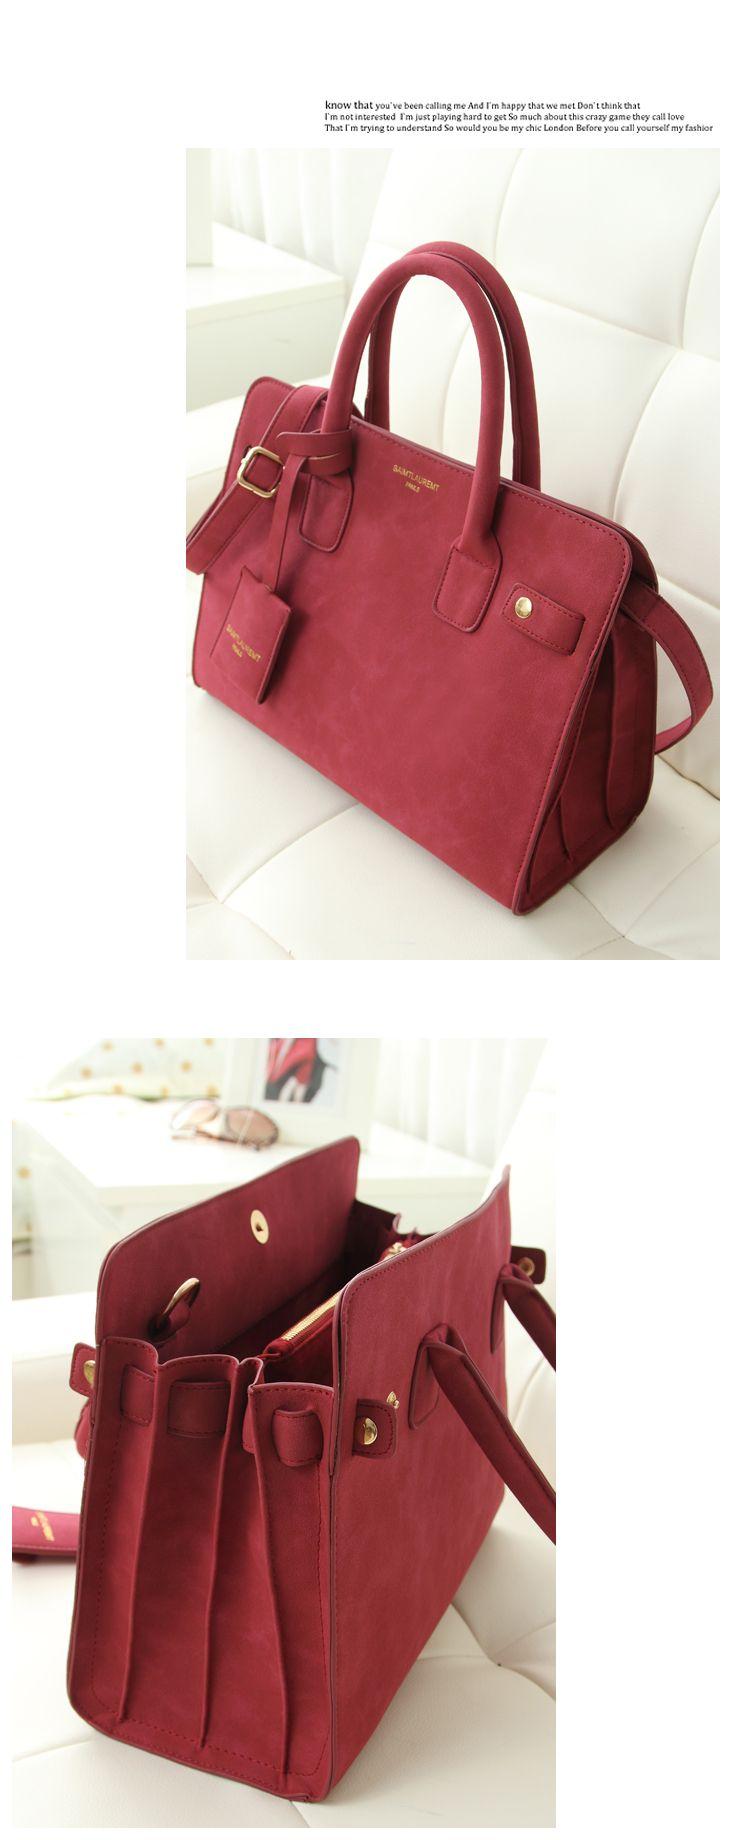 d25b903a566c Aliexpress.com  Compre Lady estilo moda requintado bolsas de ombro pérola  saco de noite